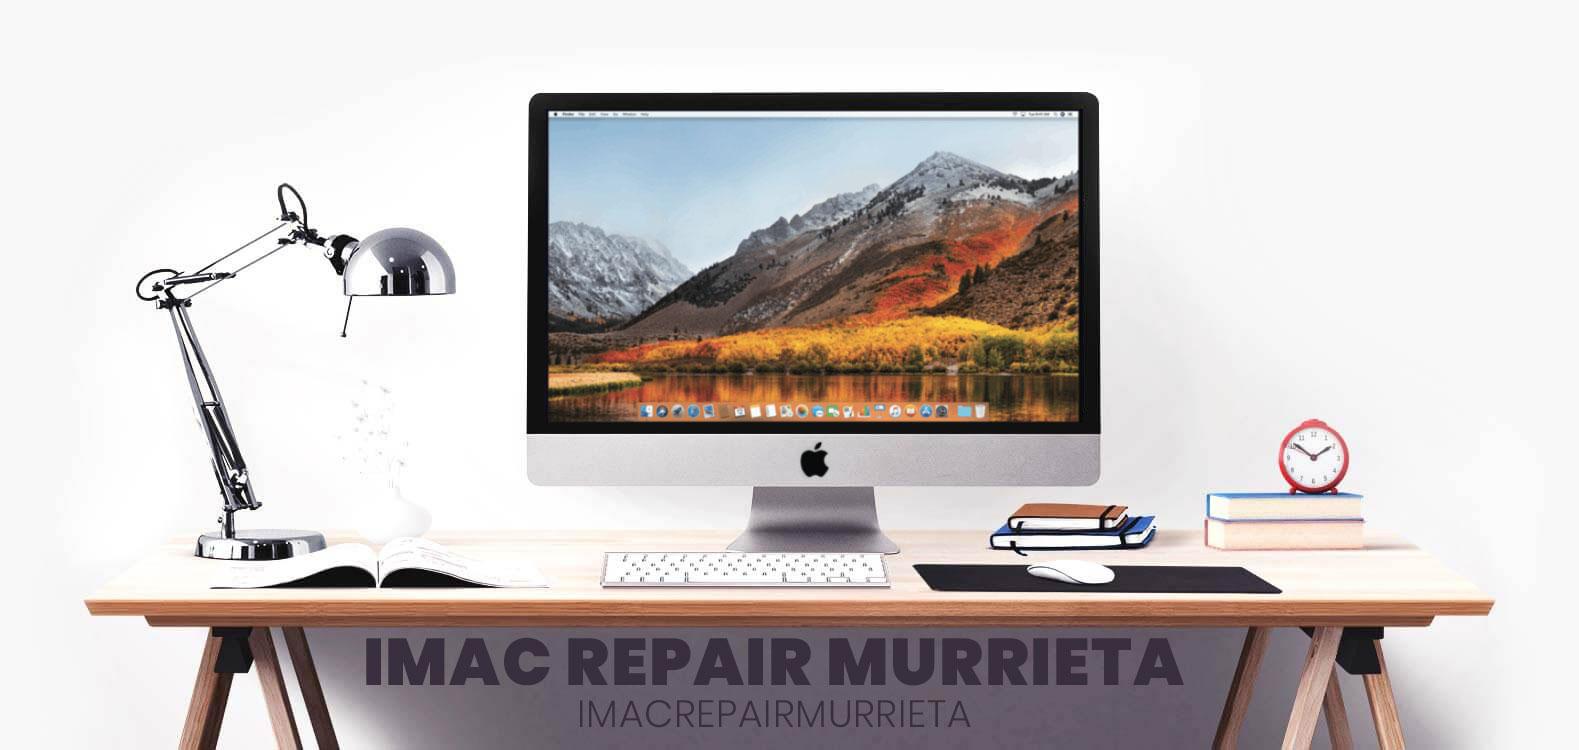 murrieta imac repair